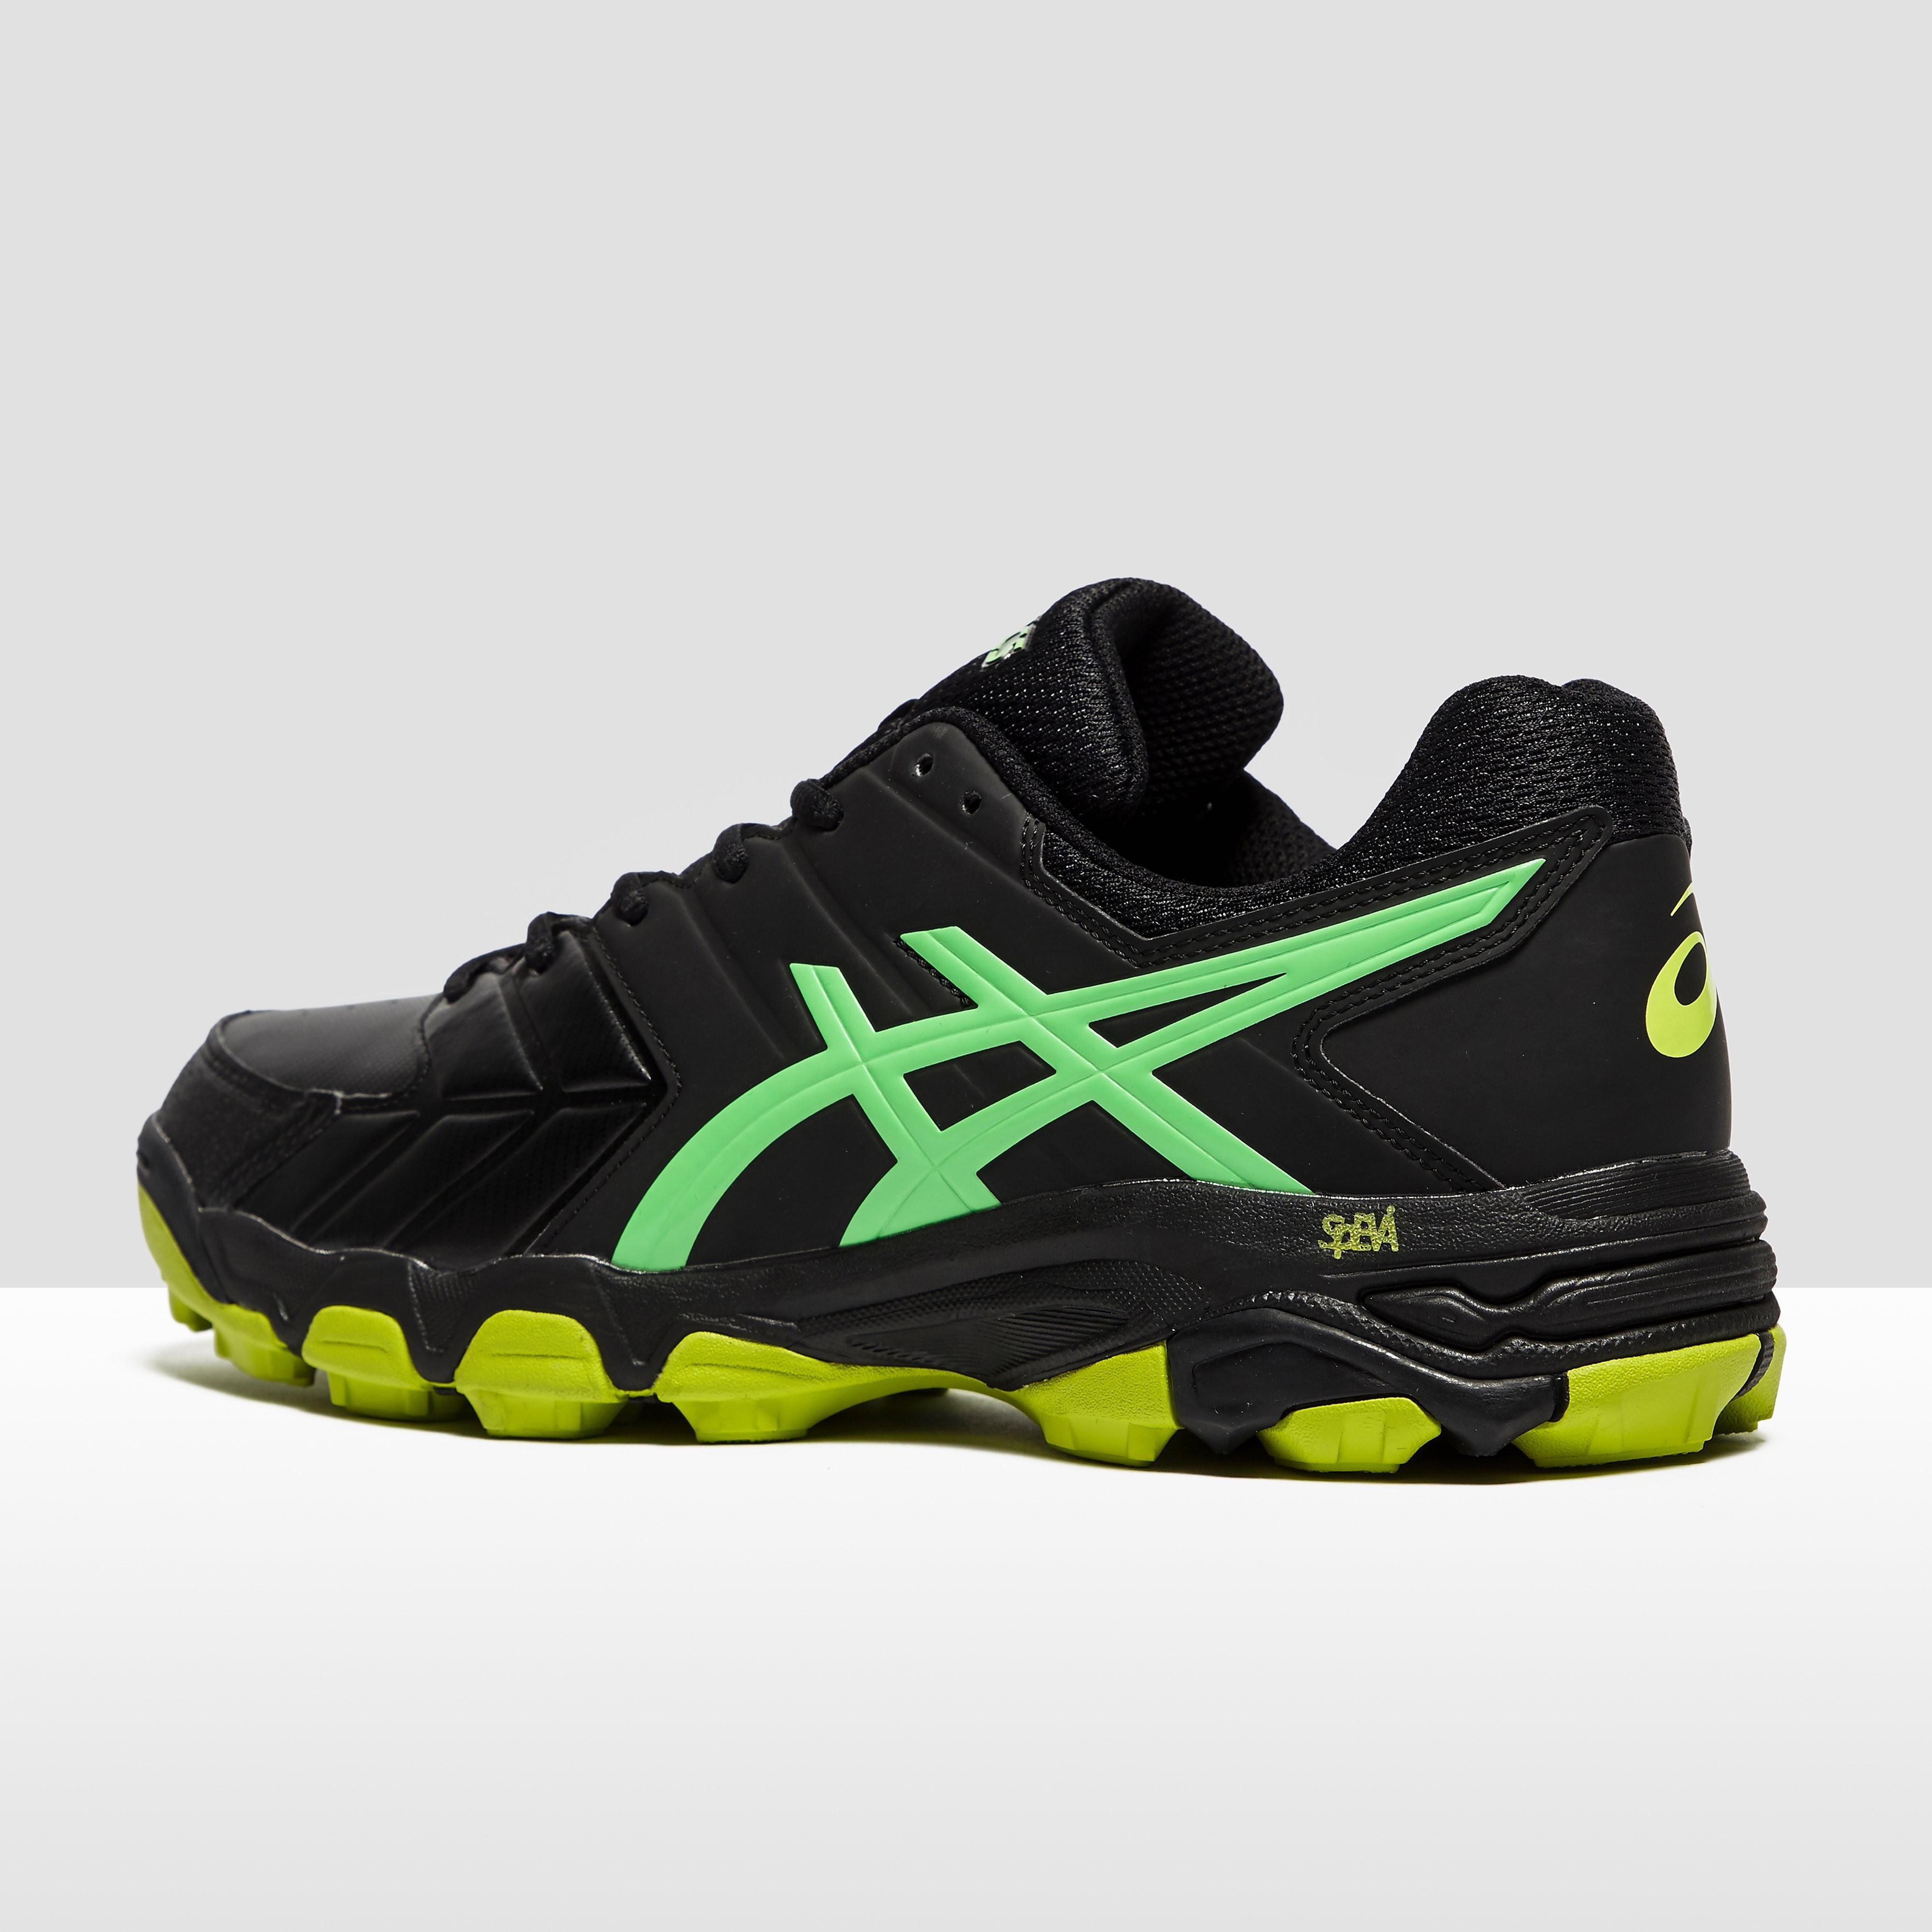 ASICS GEL-Blackheath 6 Men's Hockey Shoes